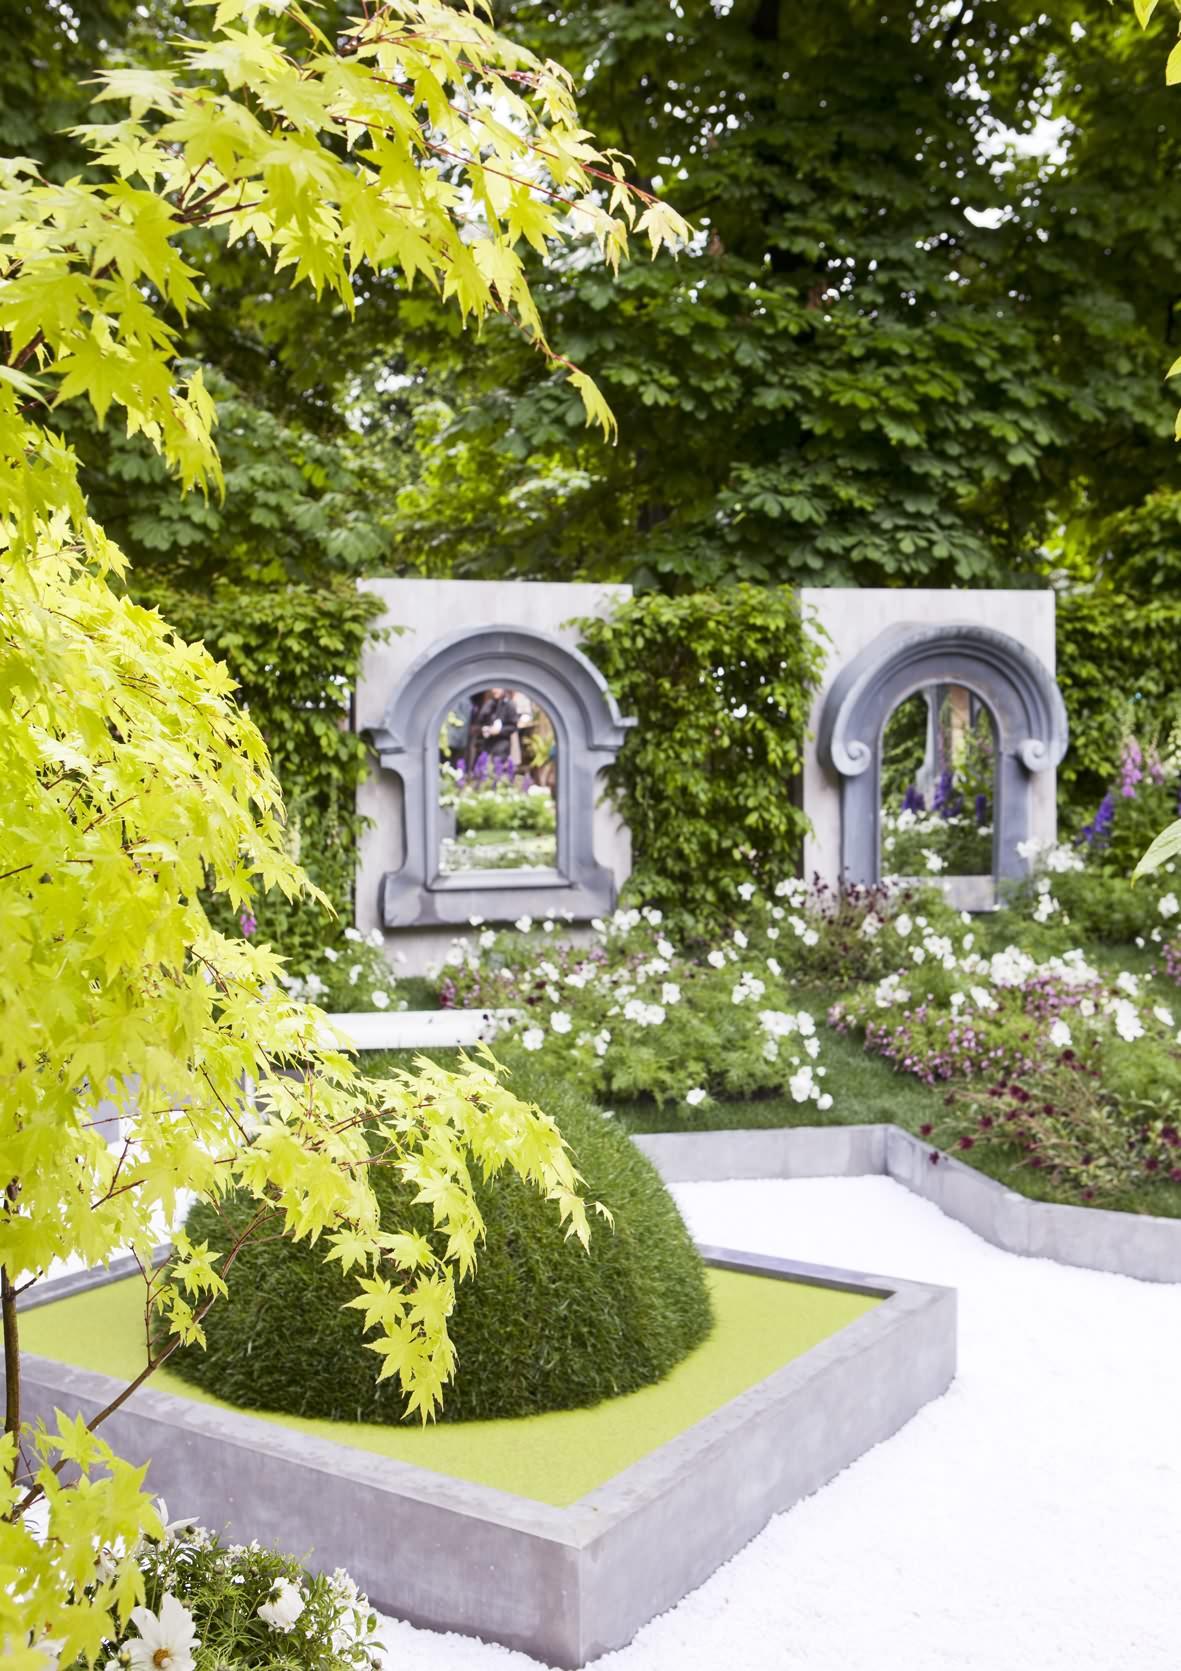 Gally_inlägg nr_Jardins jardin